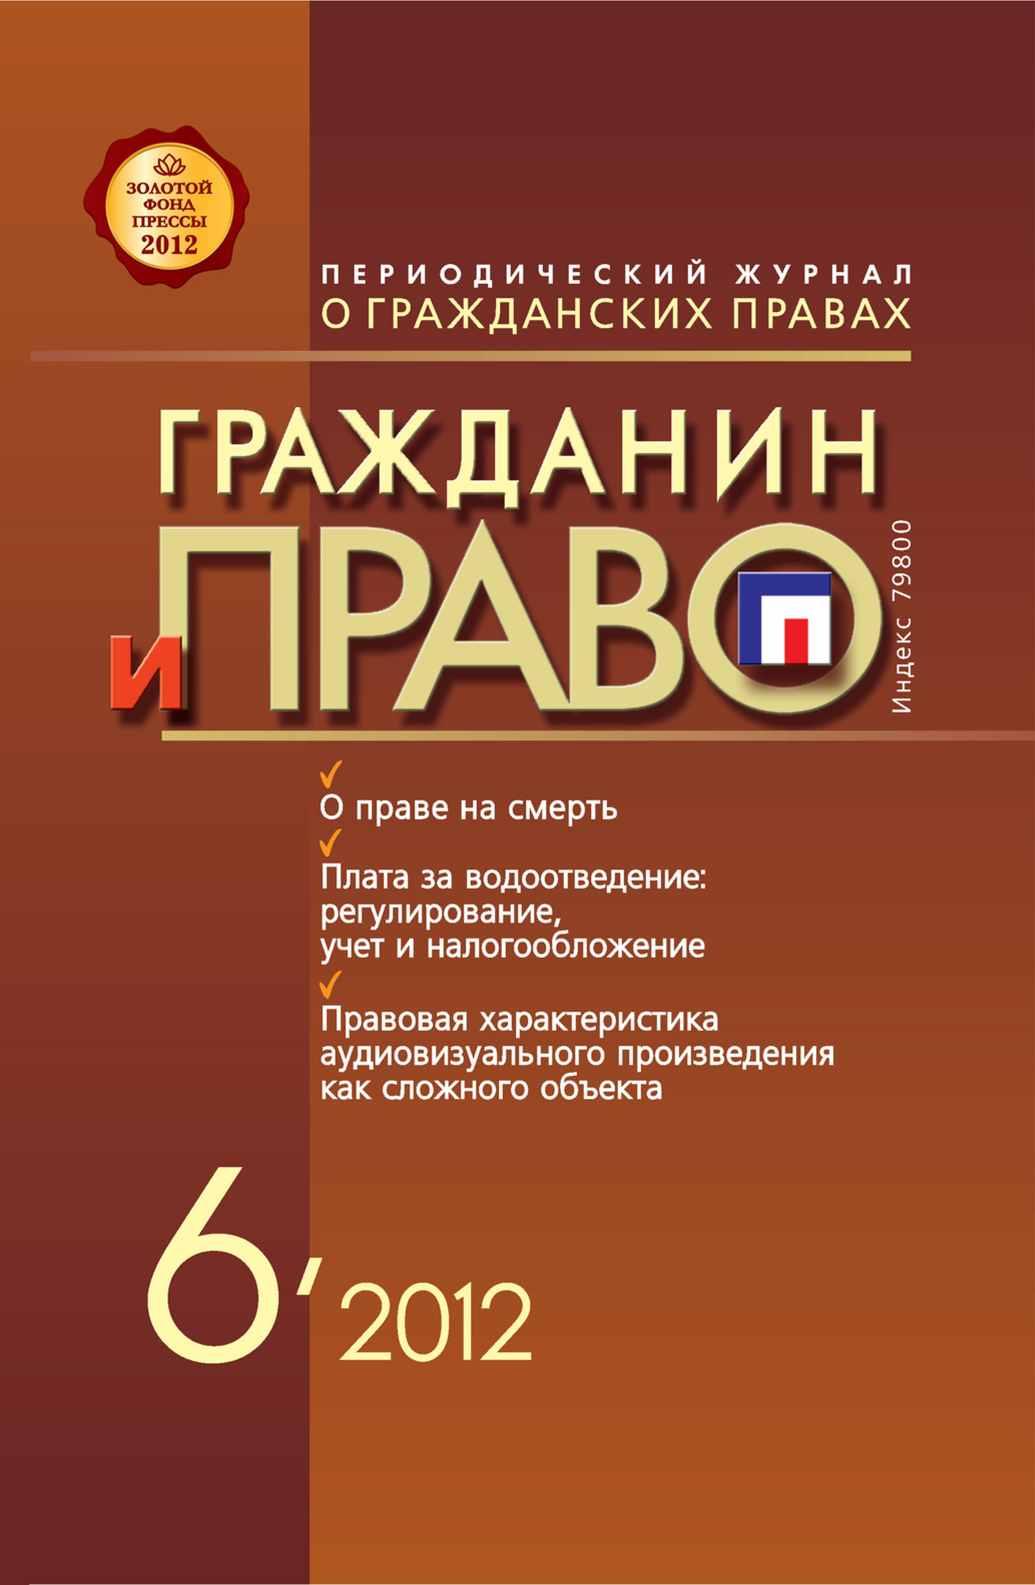 Гражданин и право №06/2012